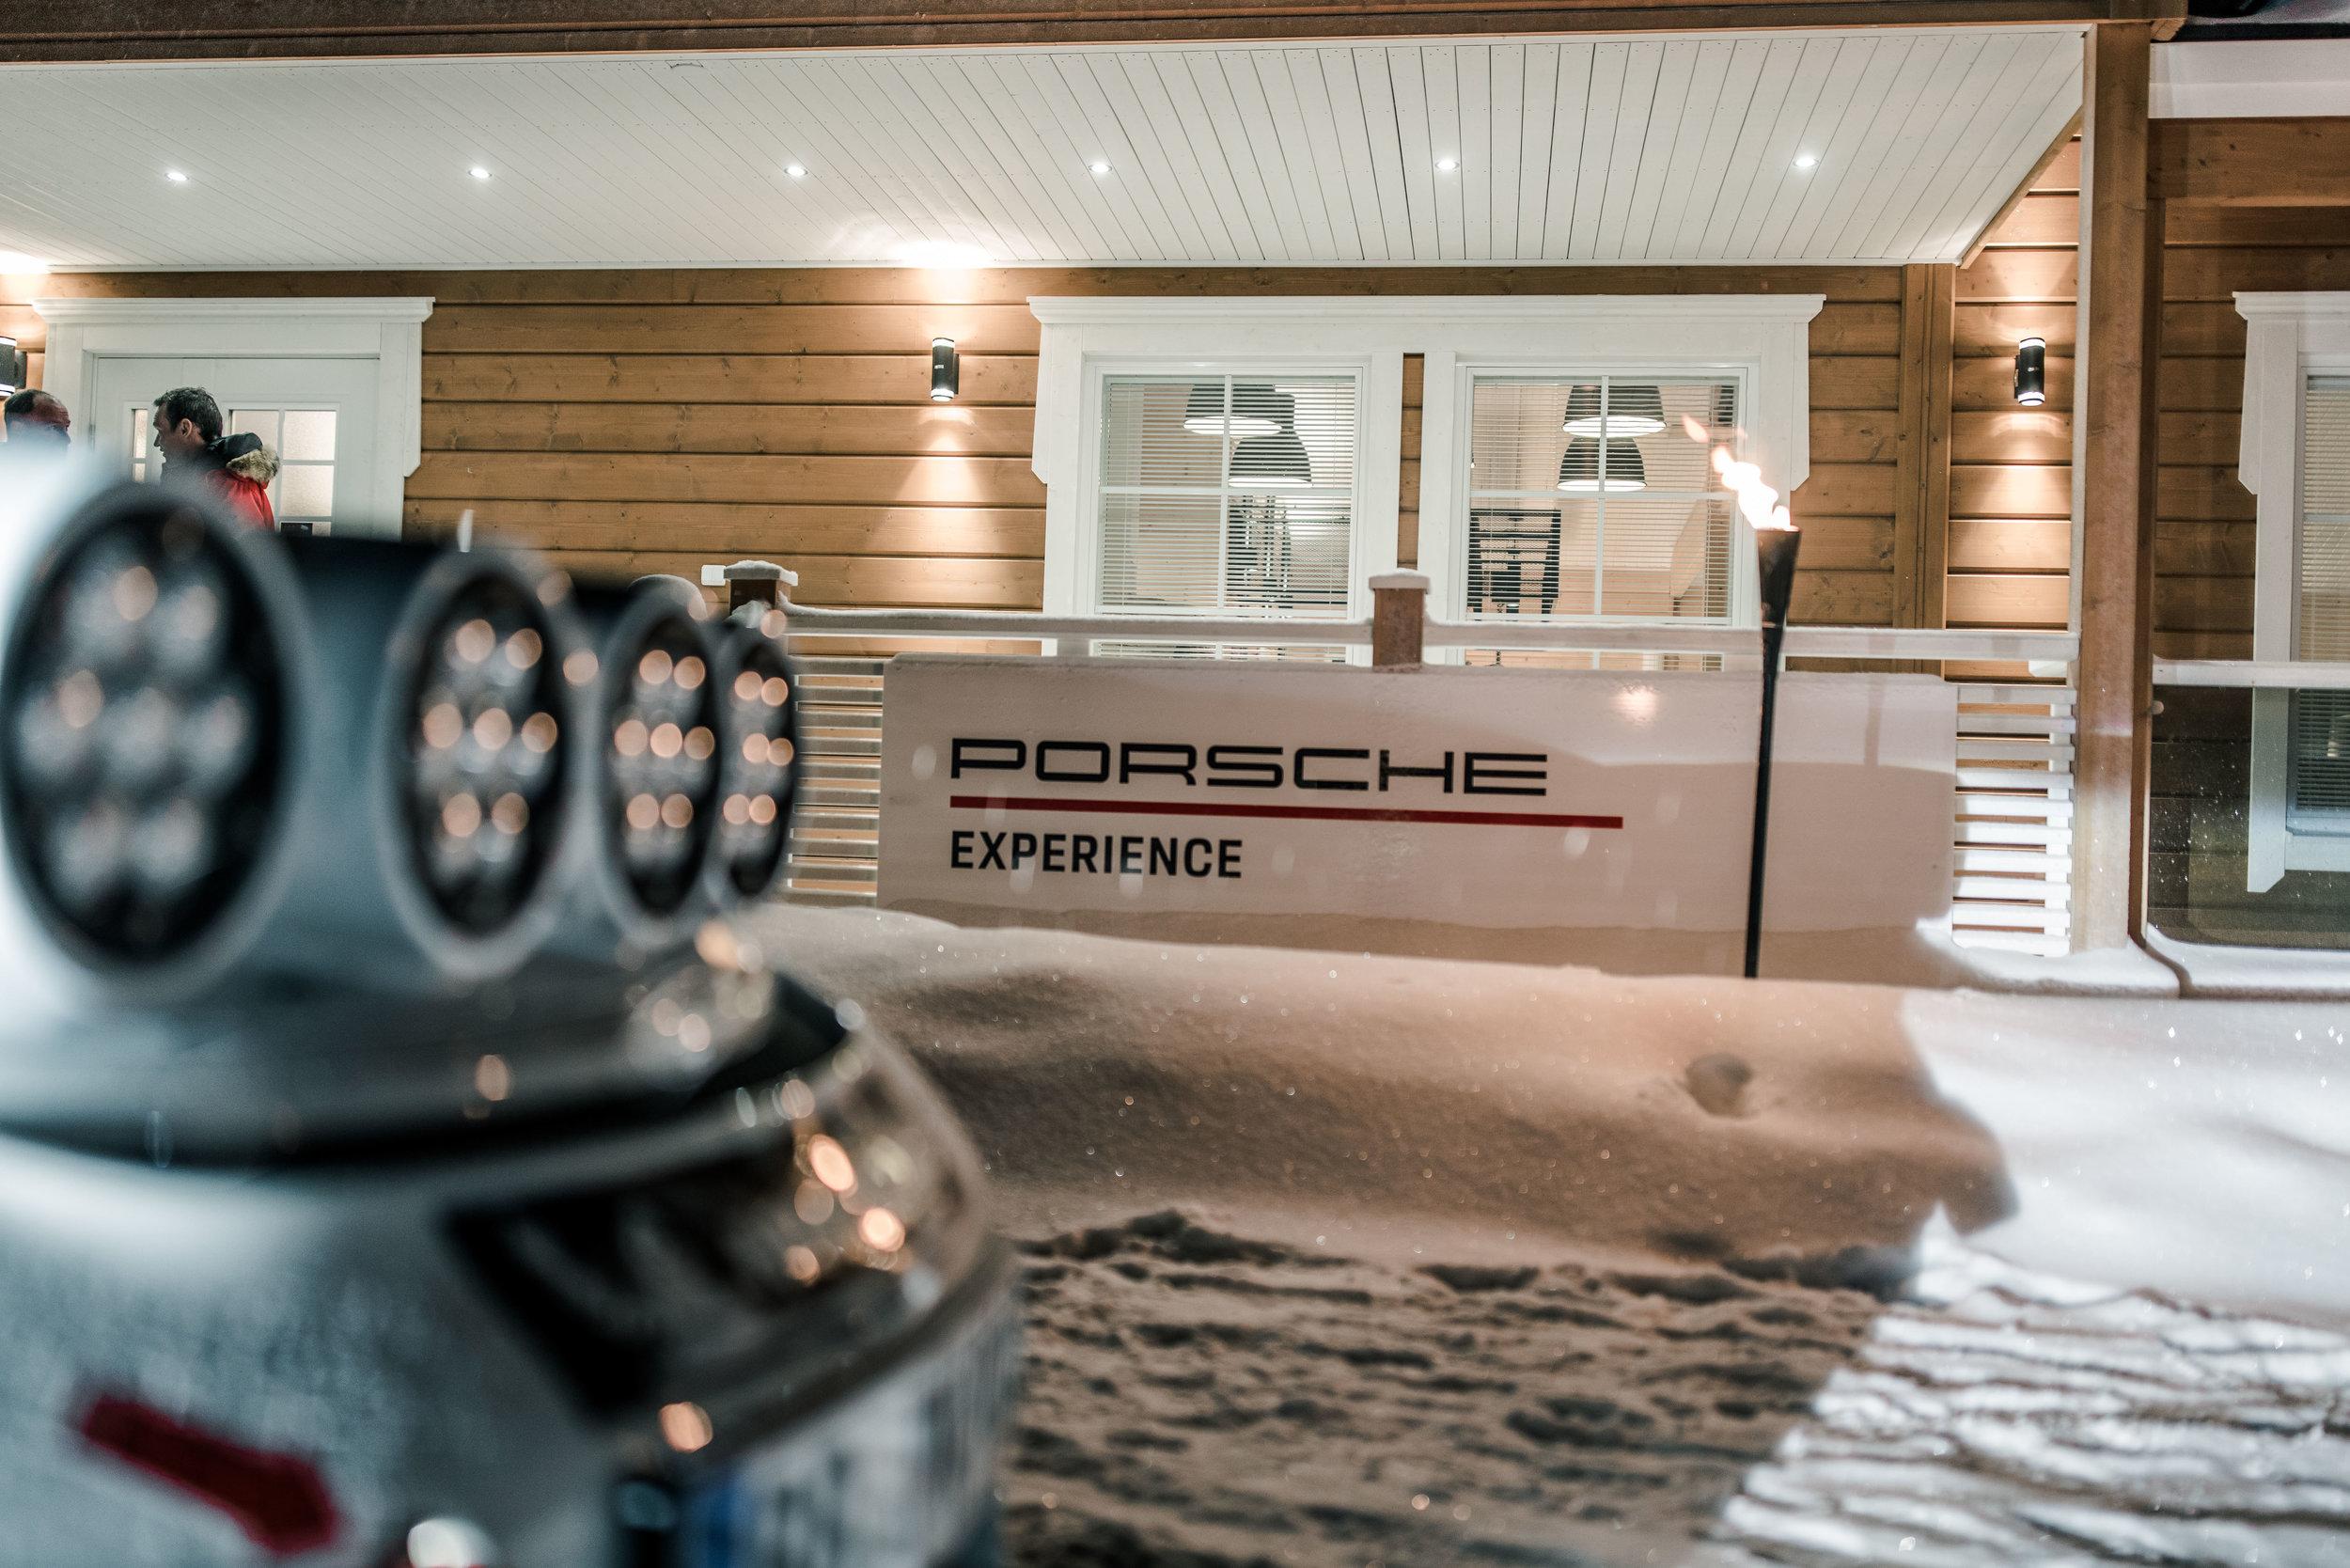 Porsche Ice Experience on Ice_30_01_2019_0598_175707.jpg